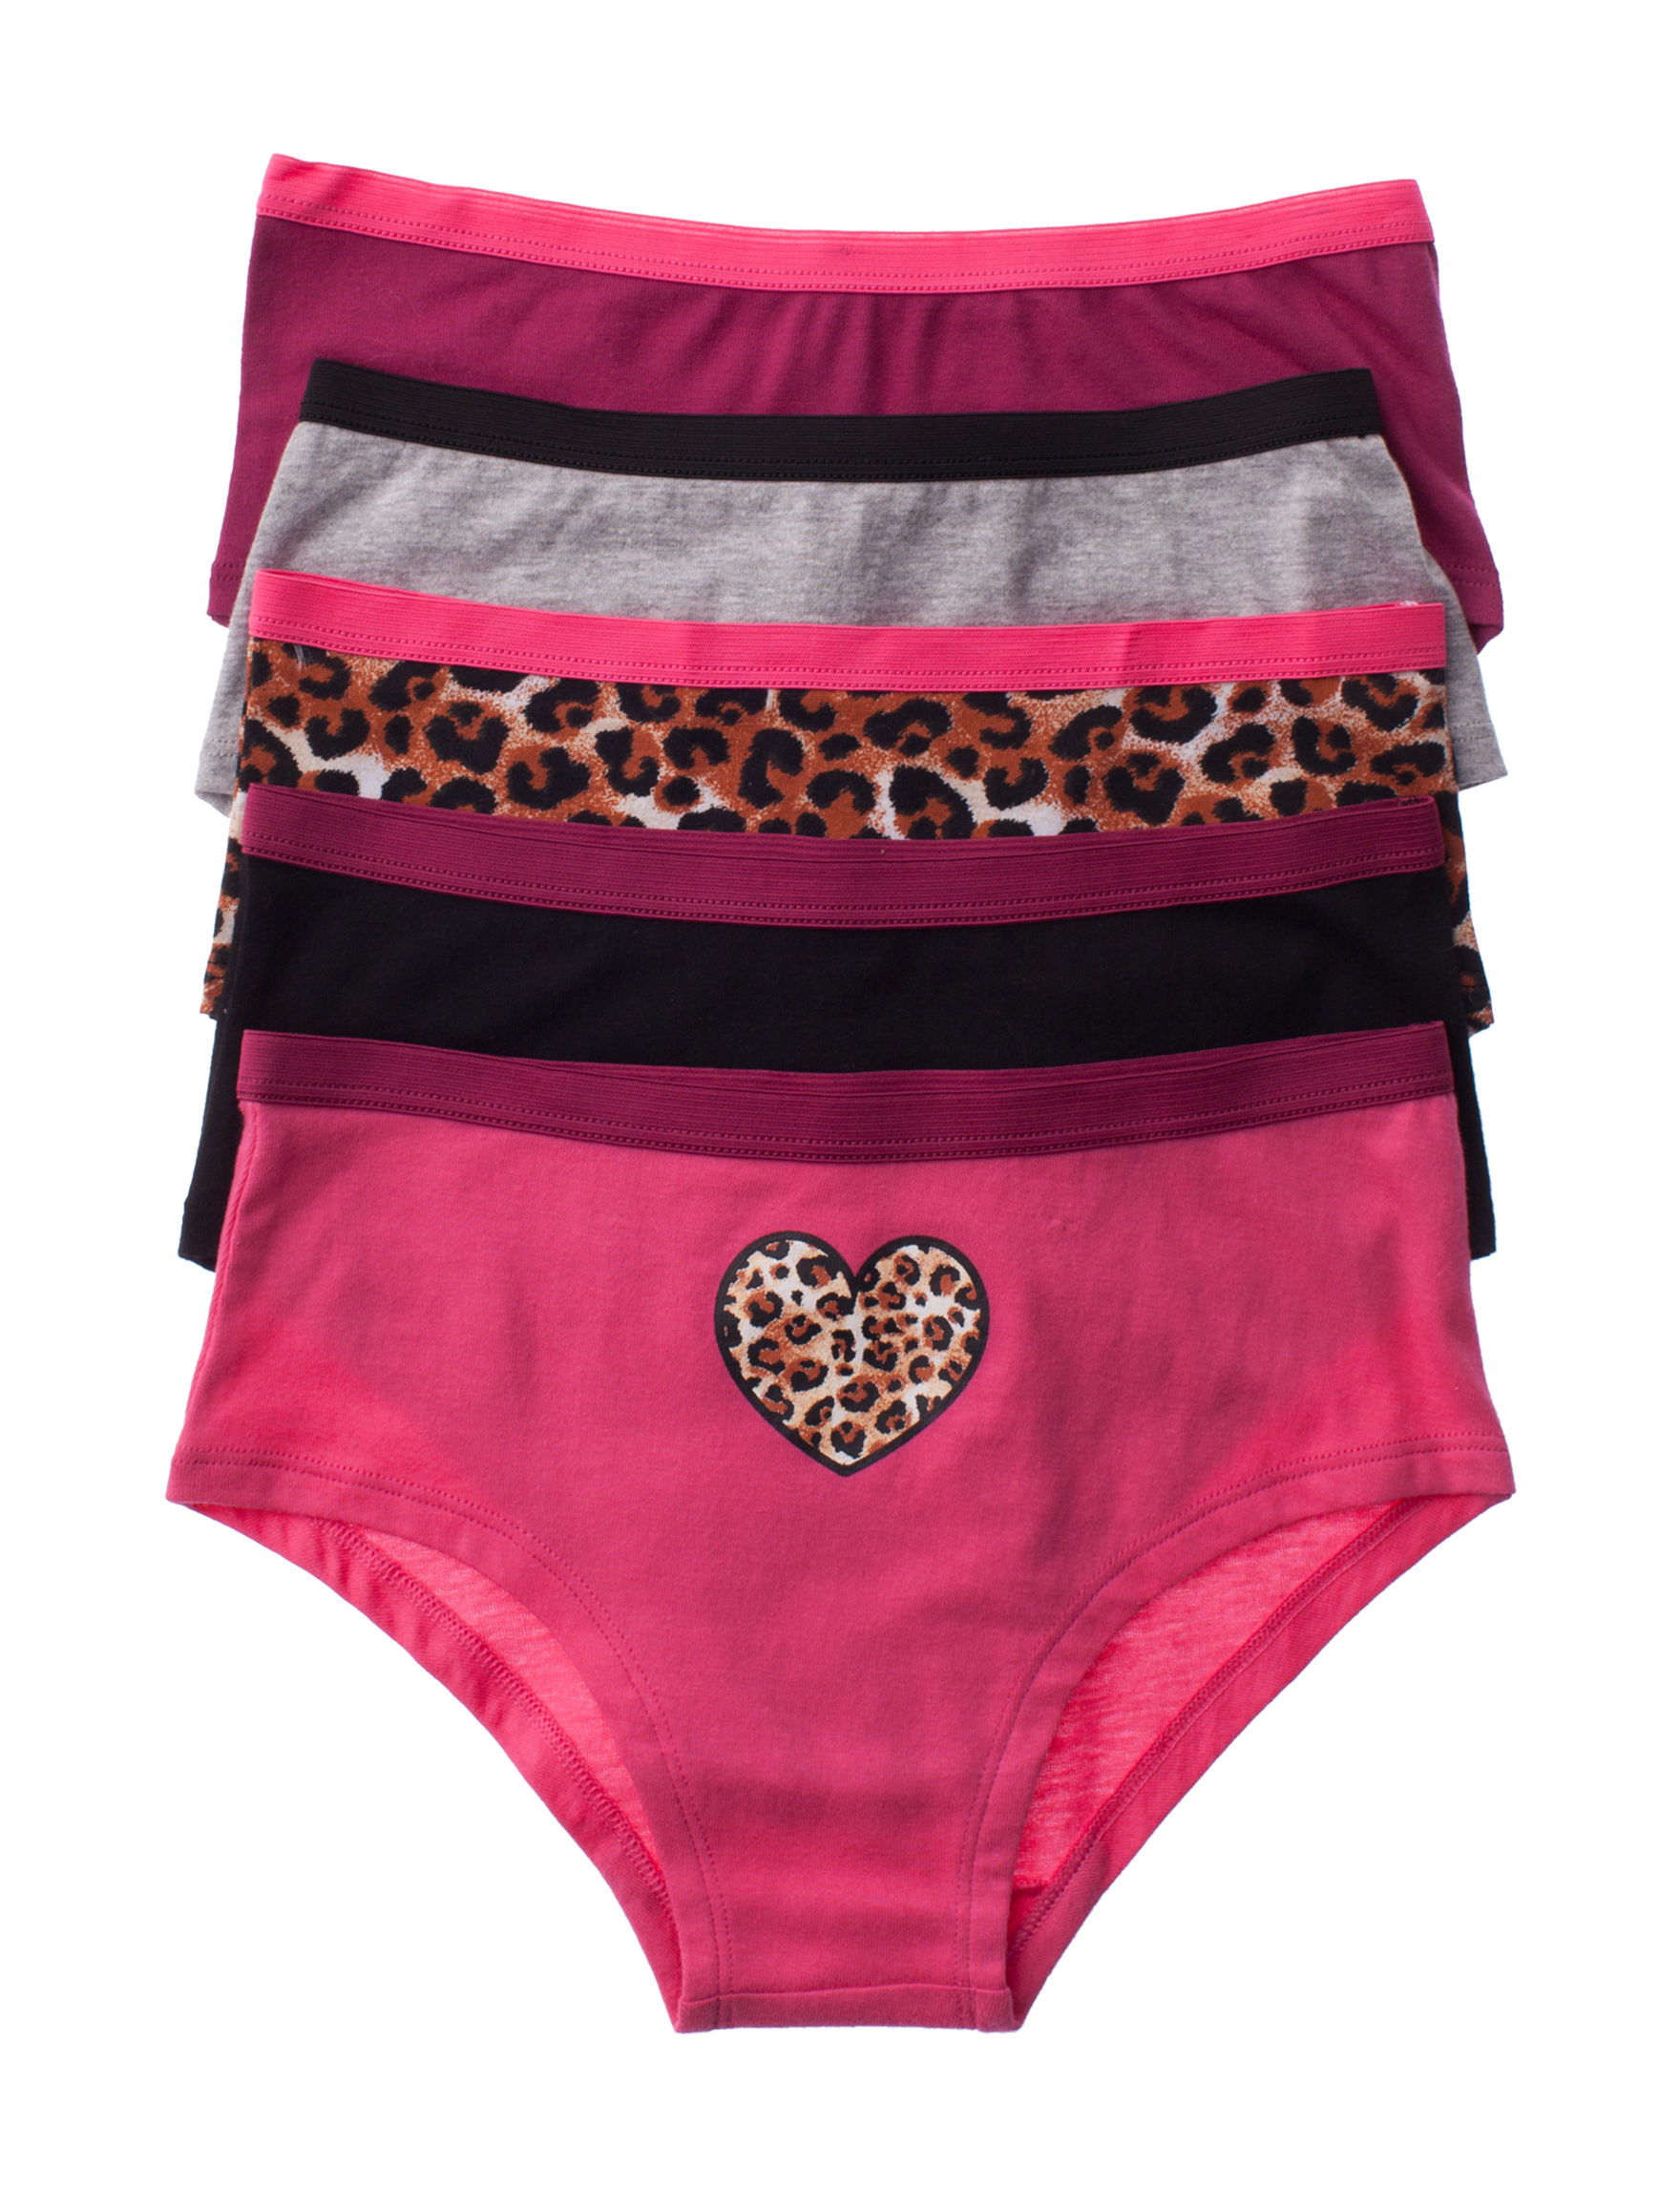 Sweet Princess Multi Color Panties